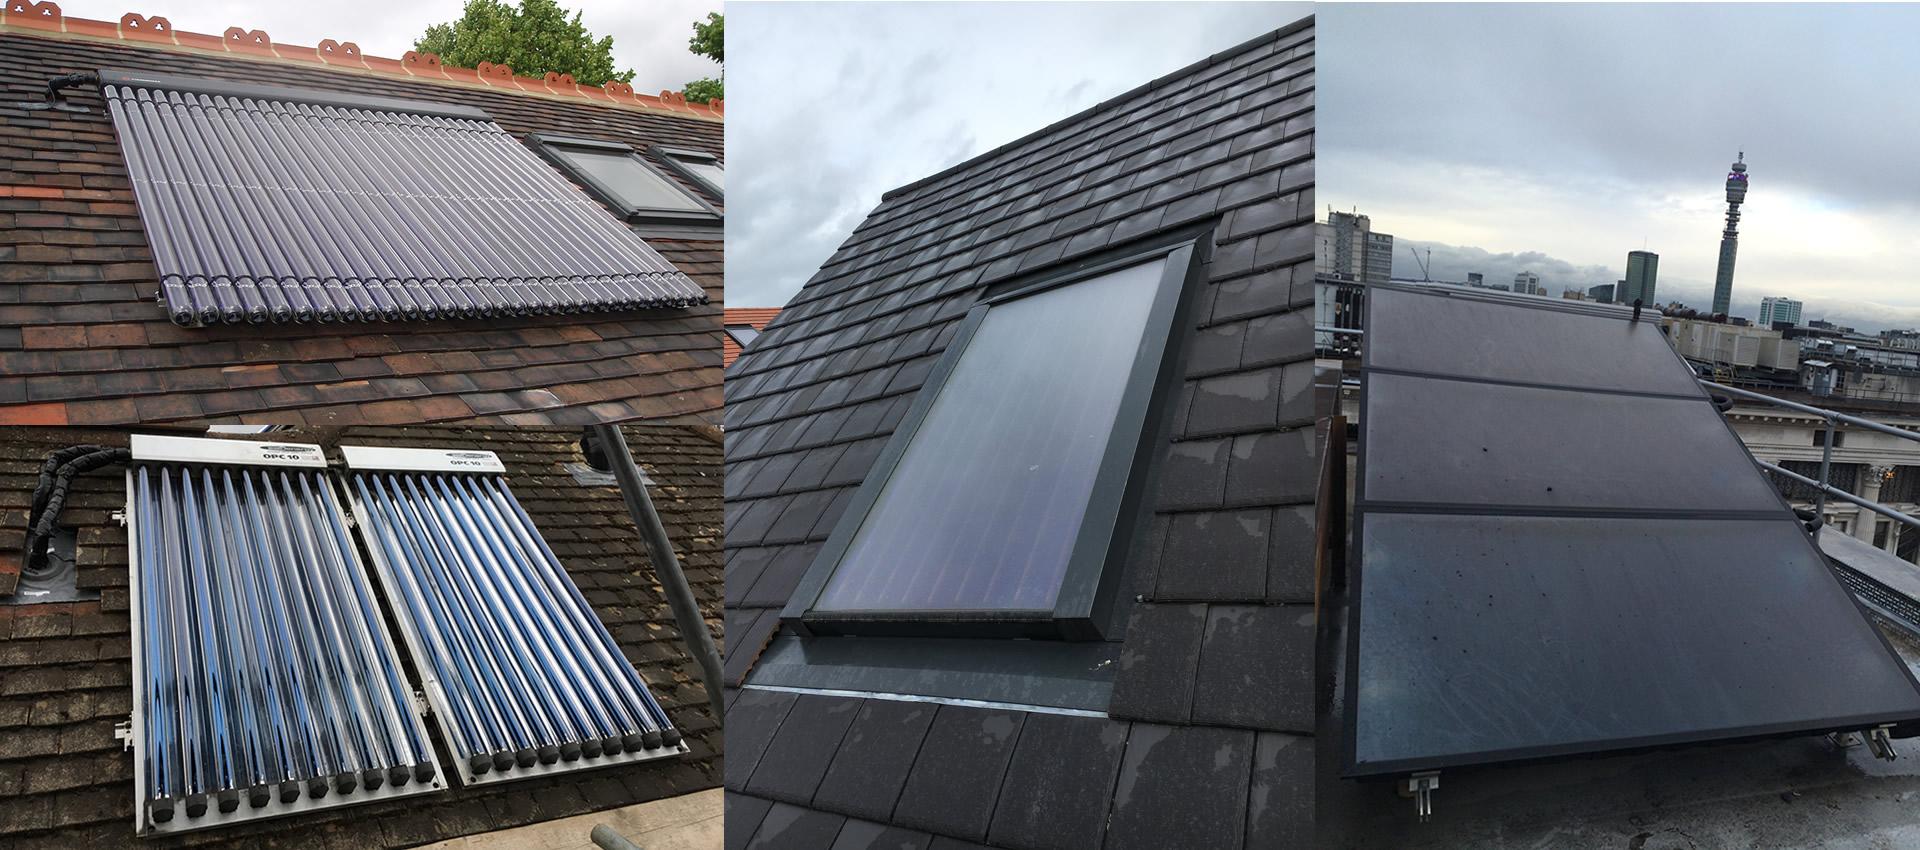 Solar Flat Panels and Solar Tubes